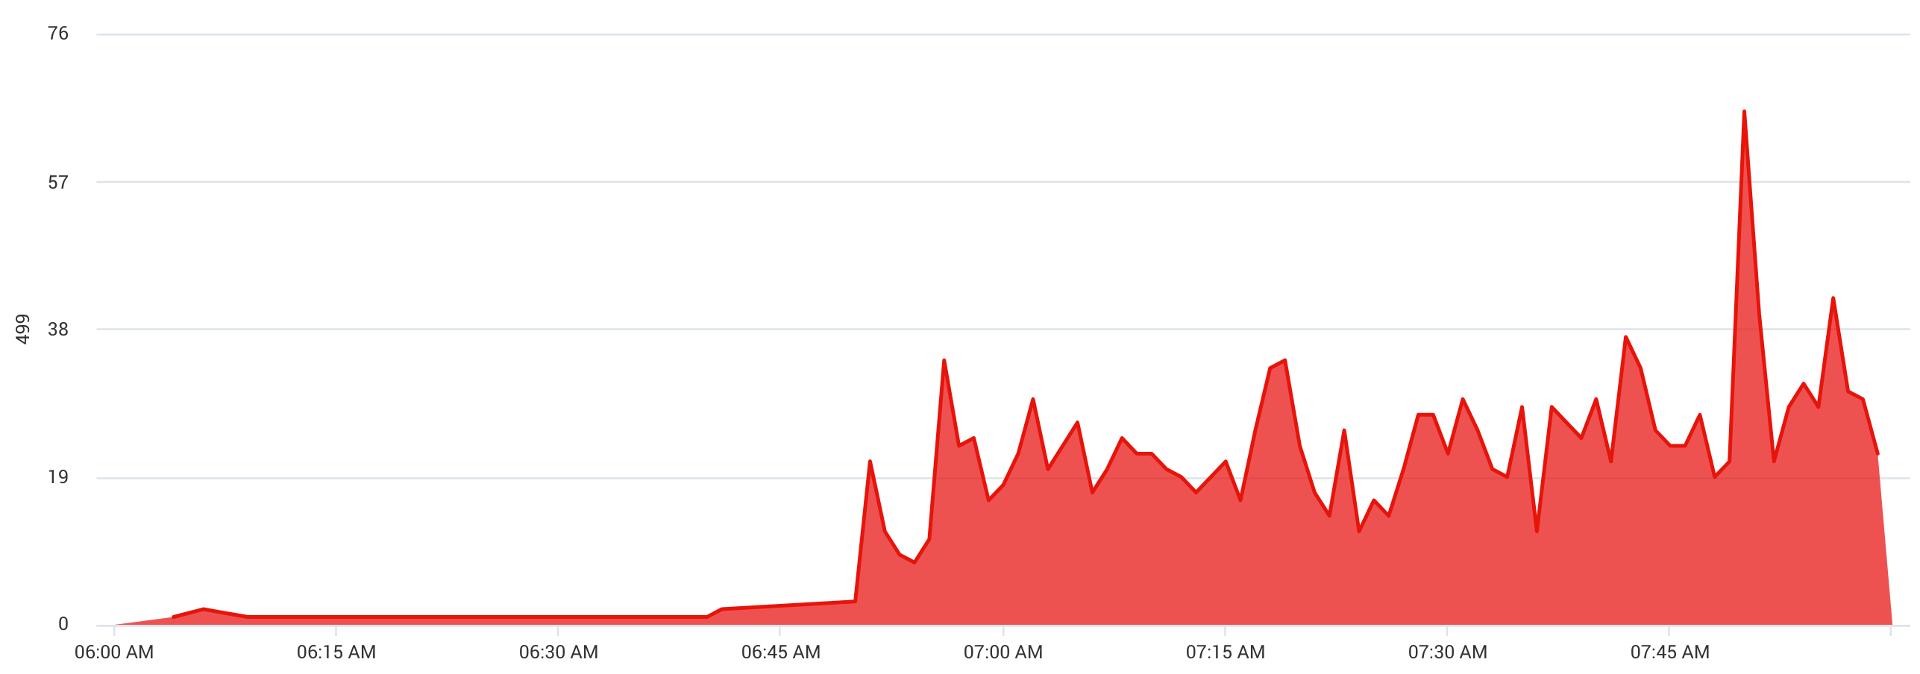 HTTP 409 status graph